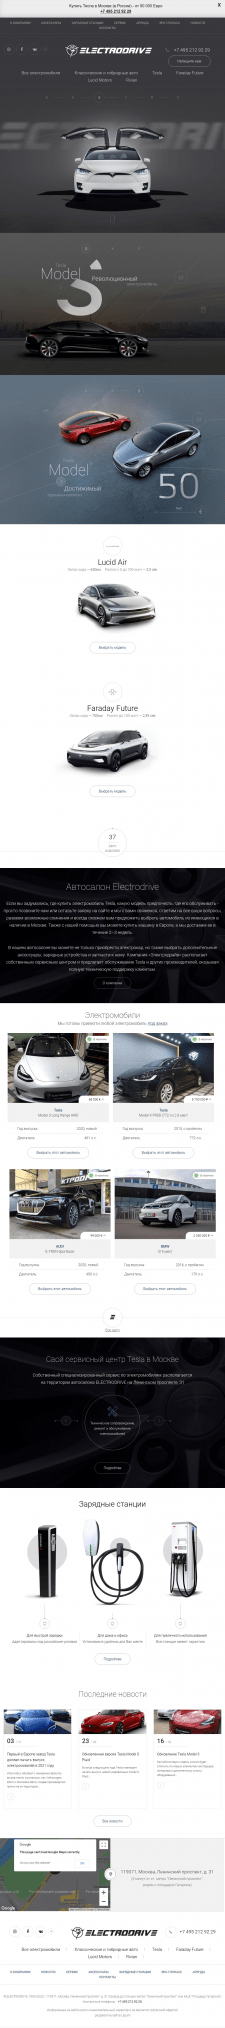 Сайт Тесла